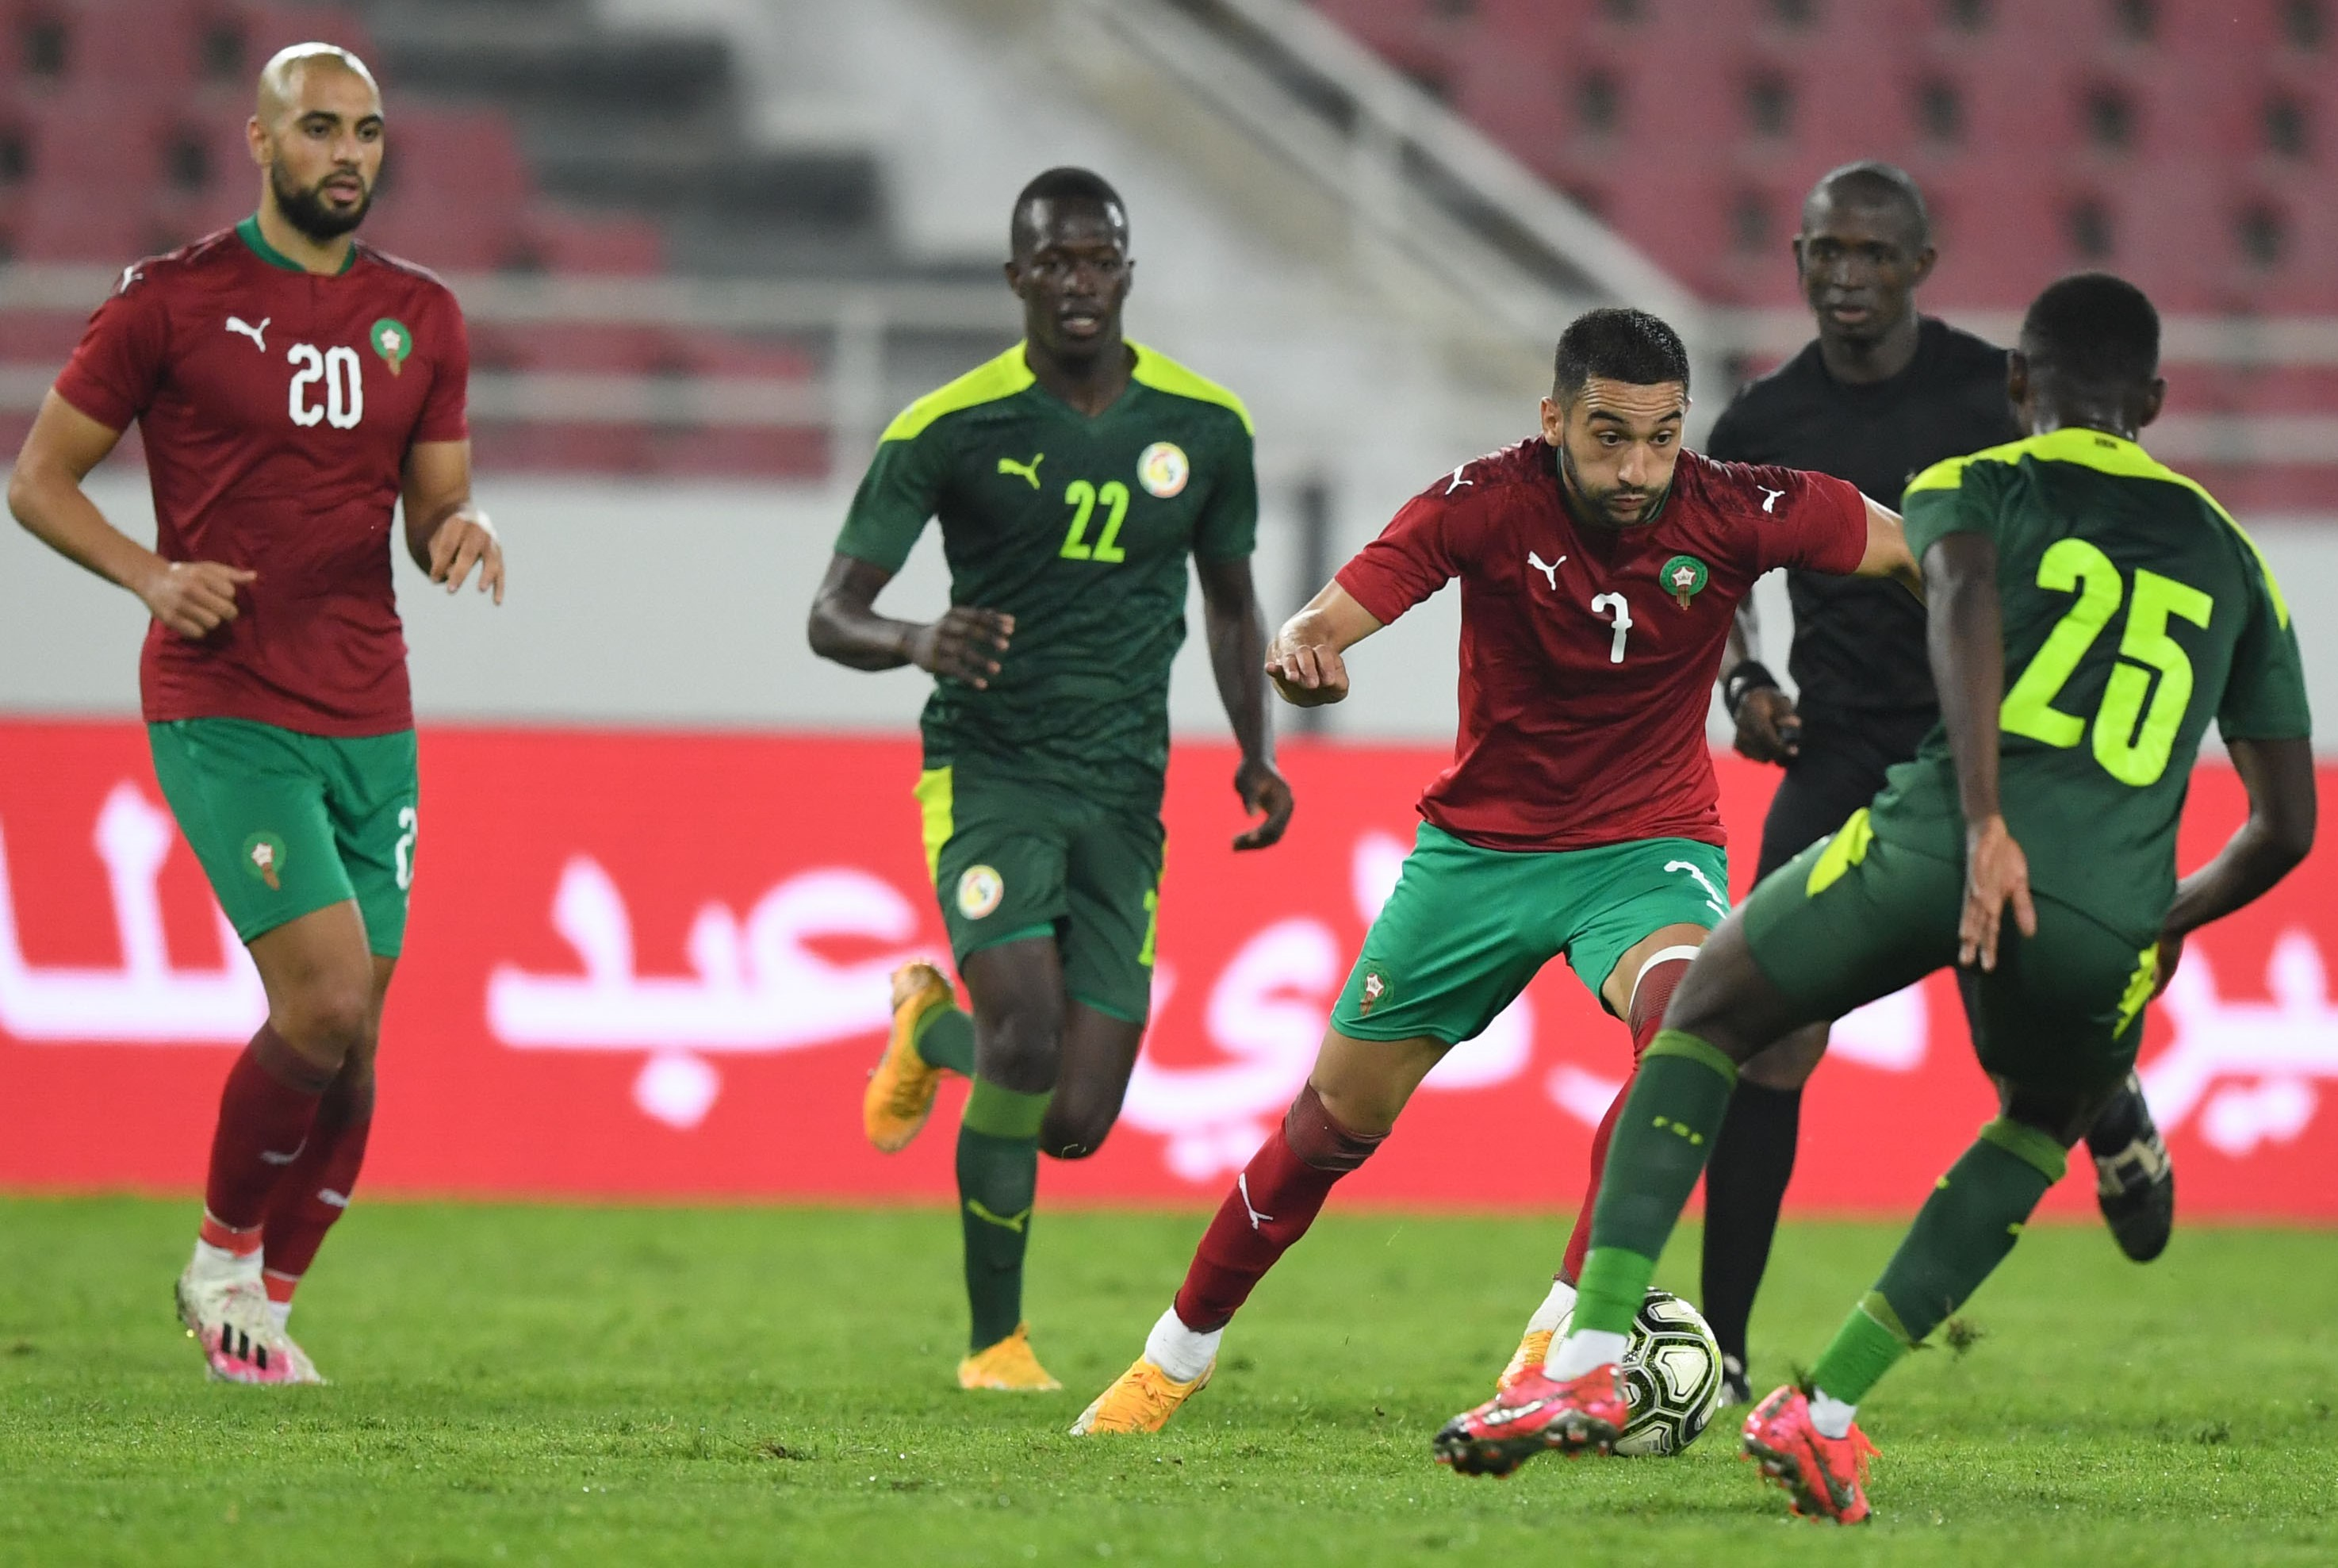 Meilleur footballeur maghrébin : Ziyech, Hakimi, Bounou et Sofiyane Amrabat nominés